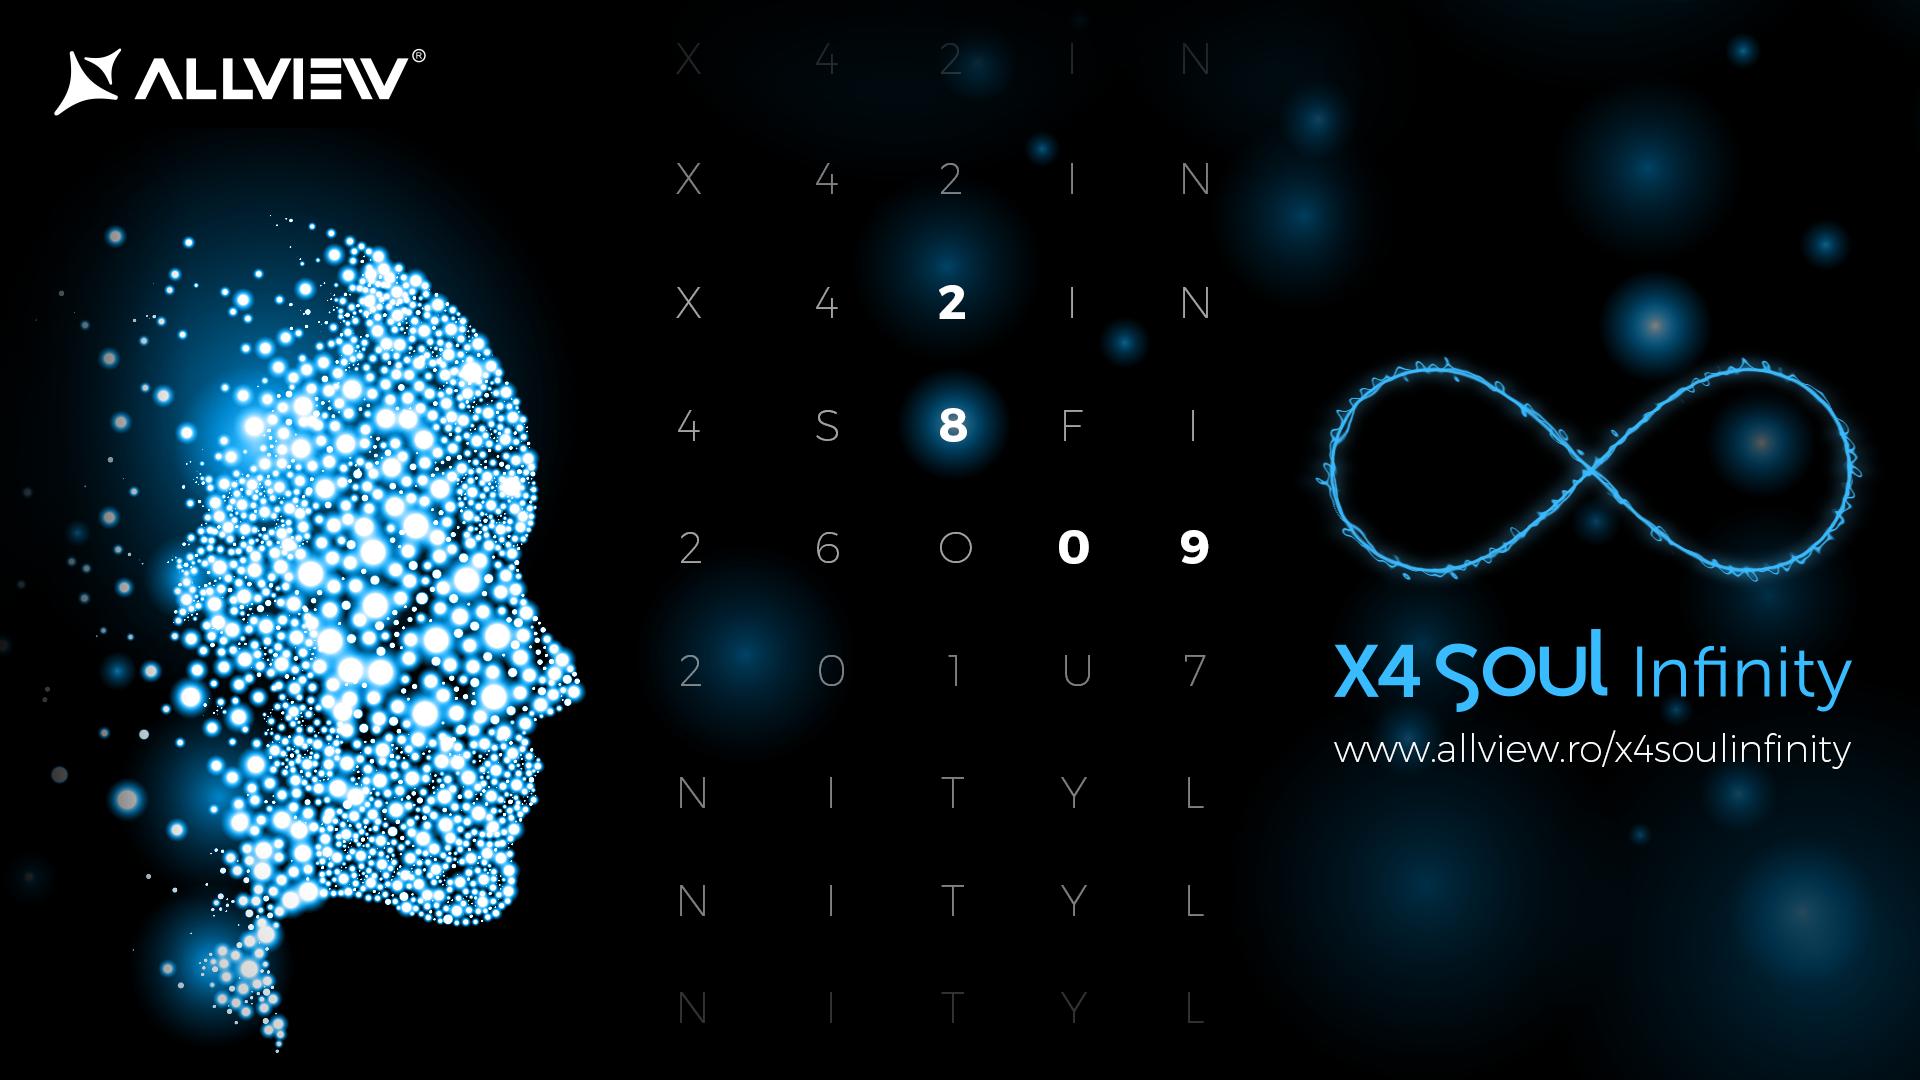 X4 SOUL INFINITY_LANSARE